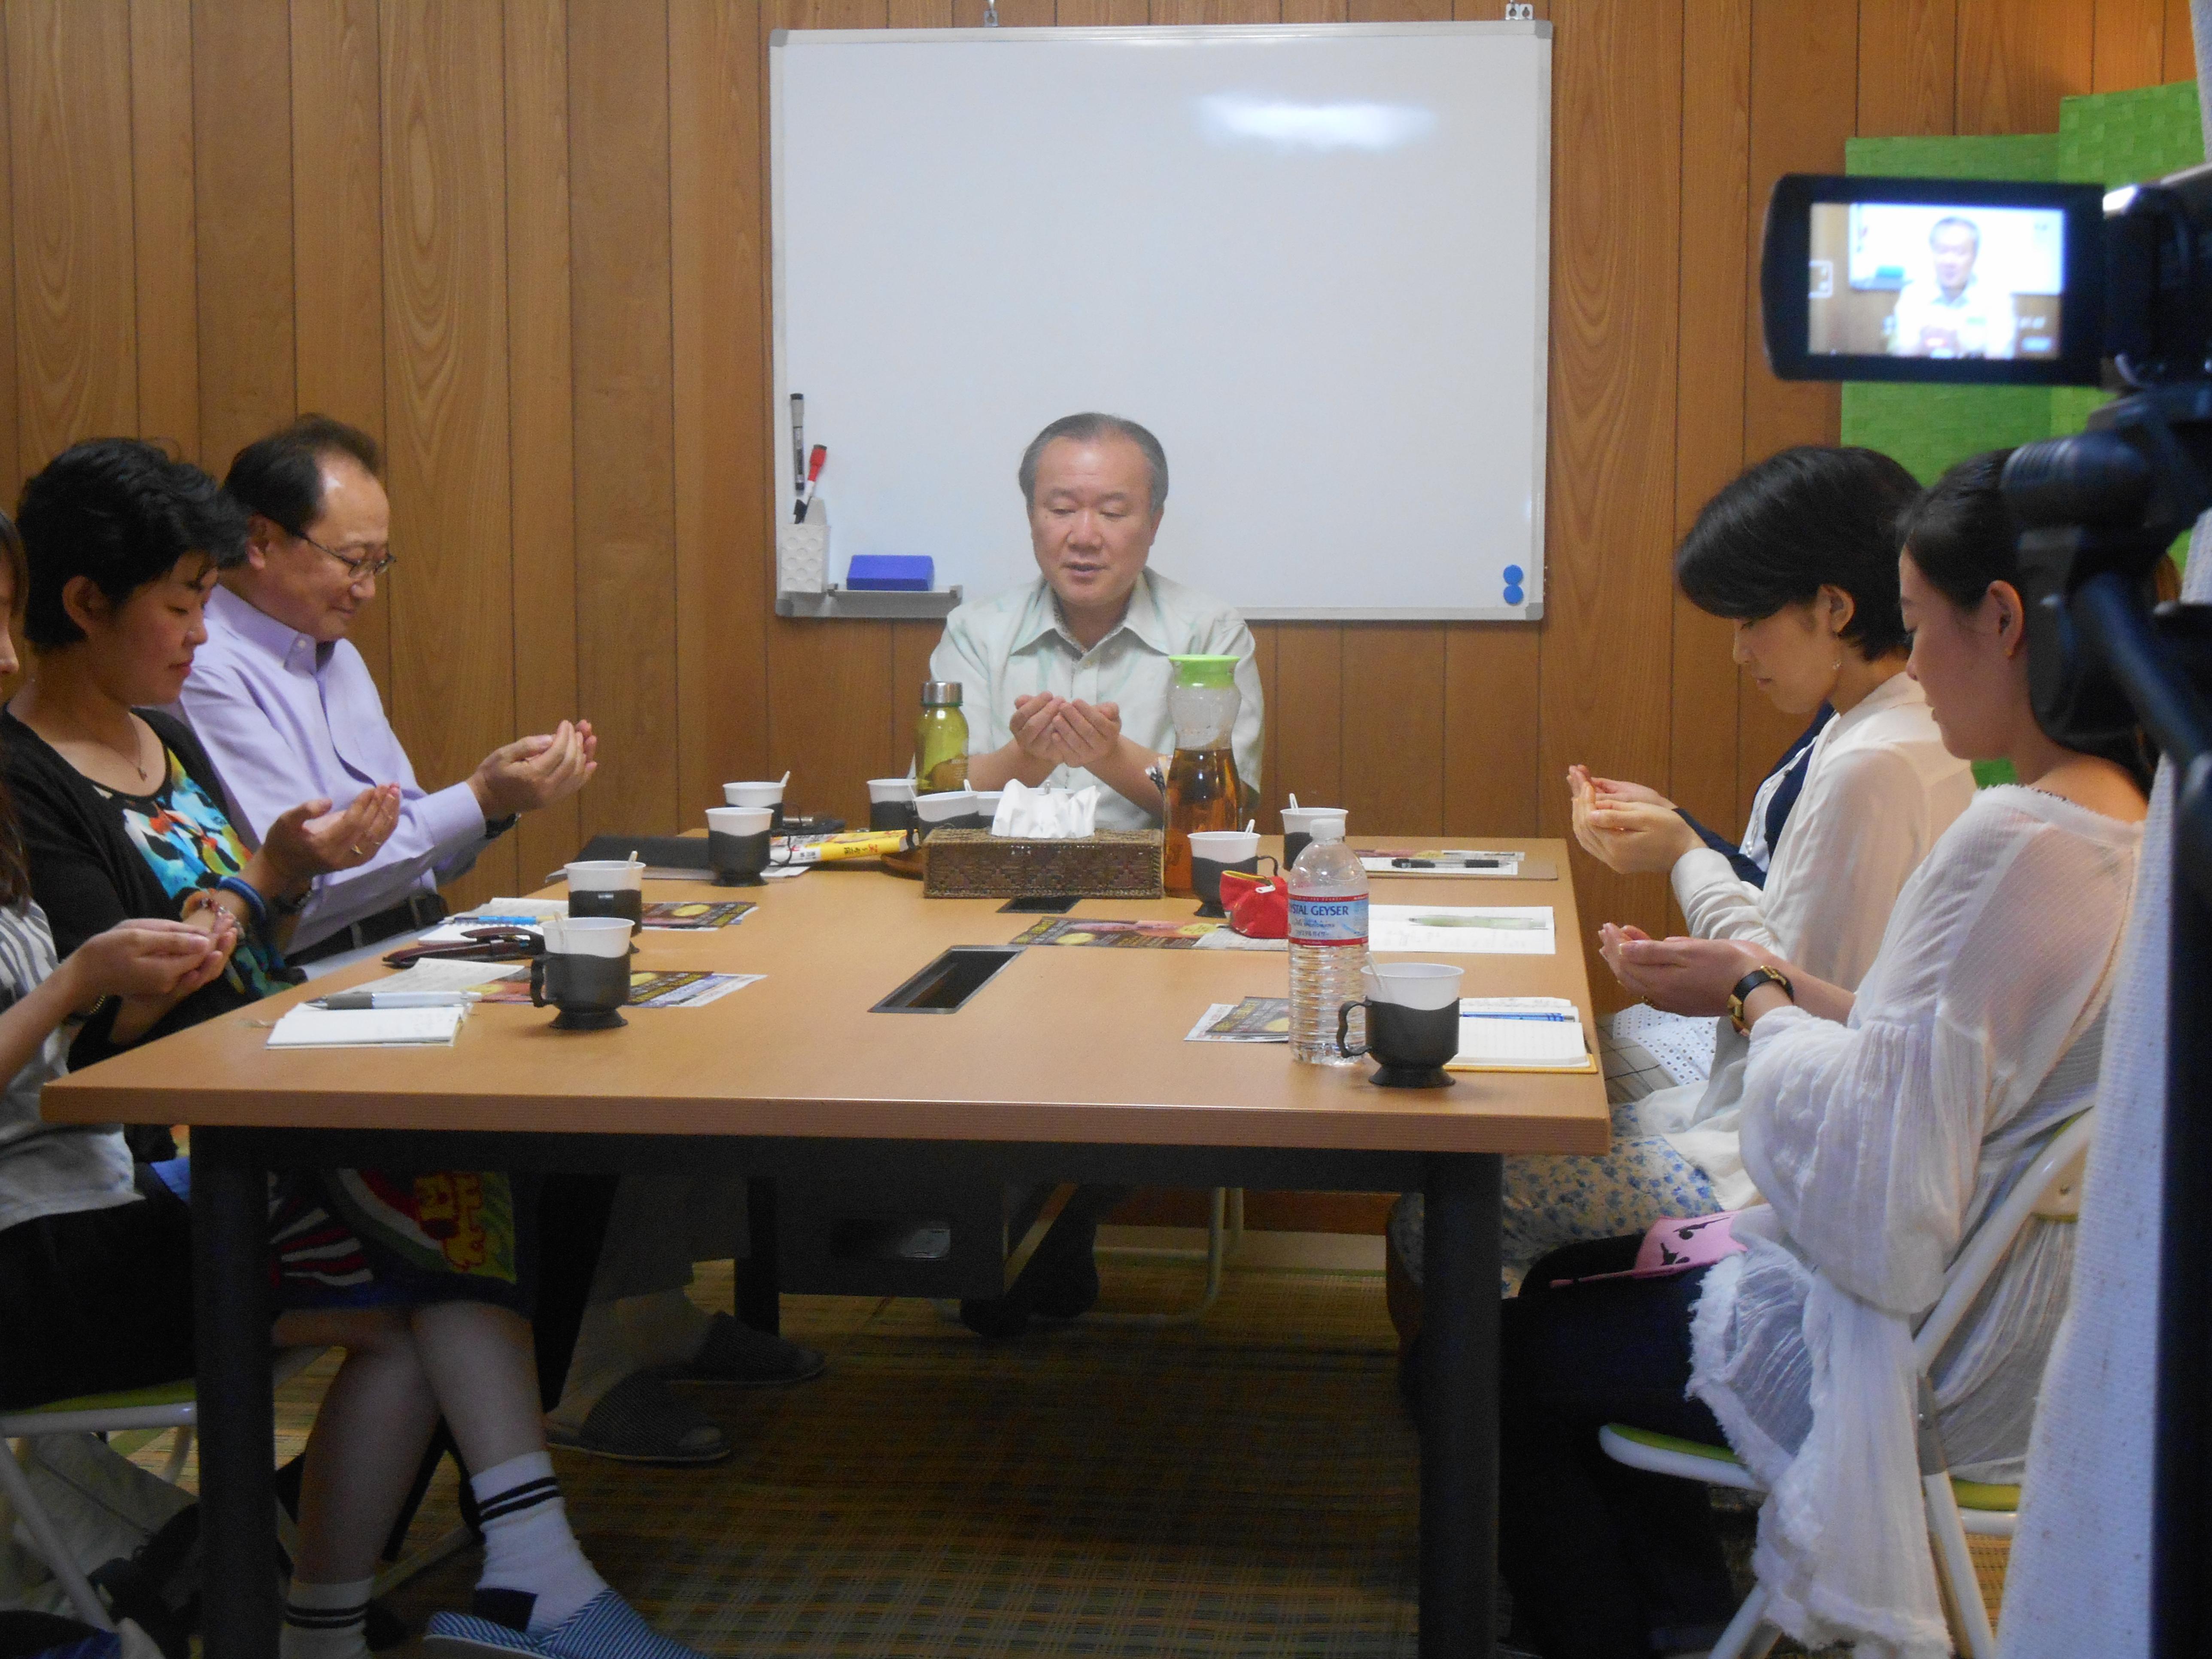 DSCN4885 - 池川先生から教えて頂いた令和の時代の生き方